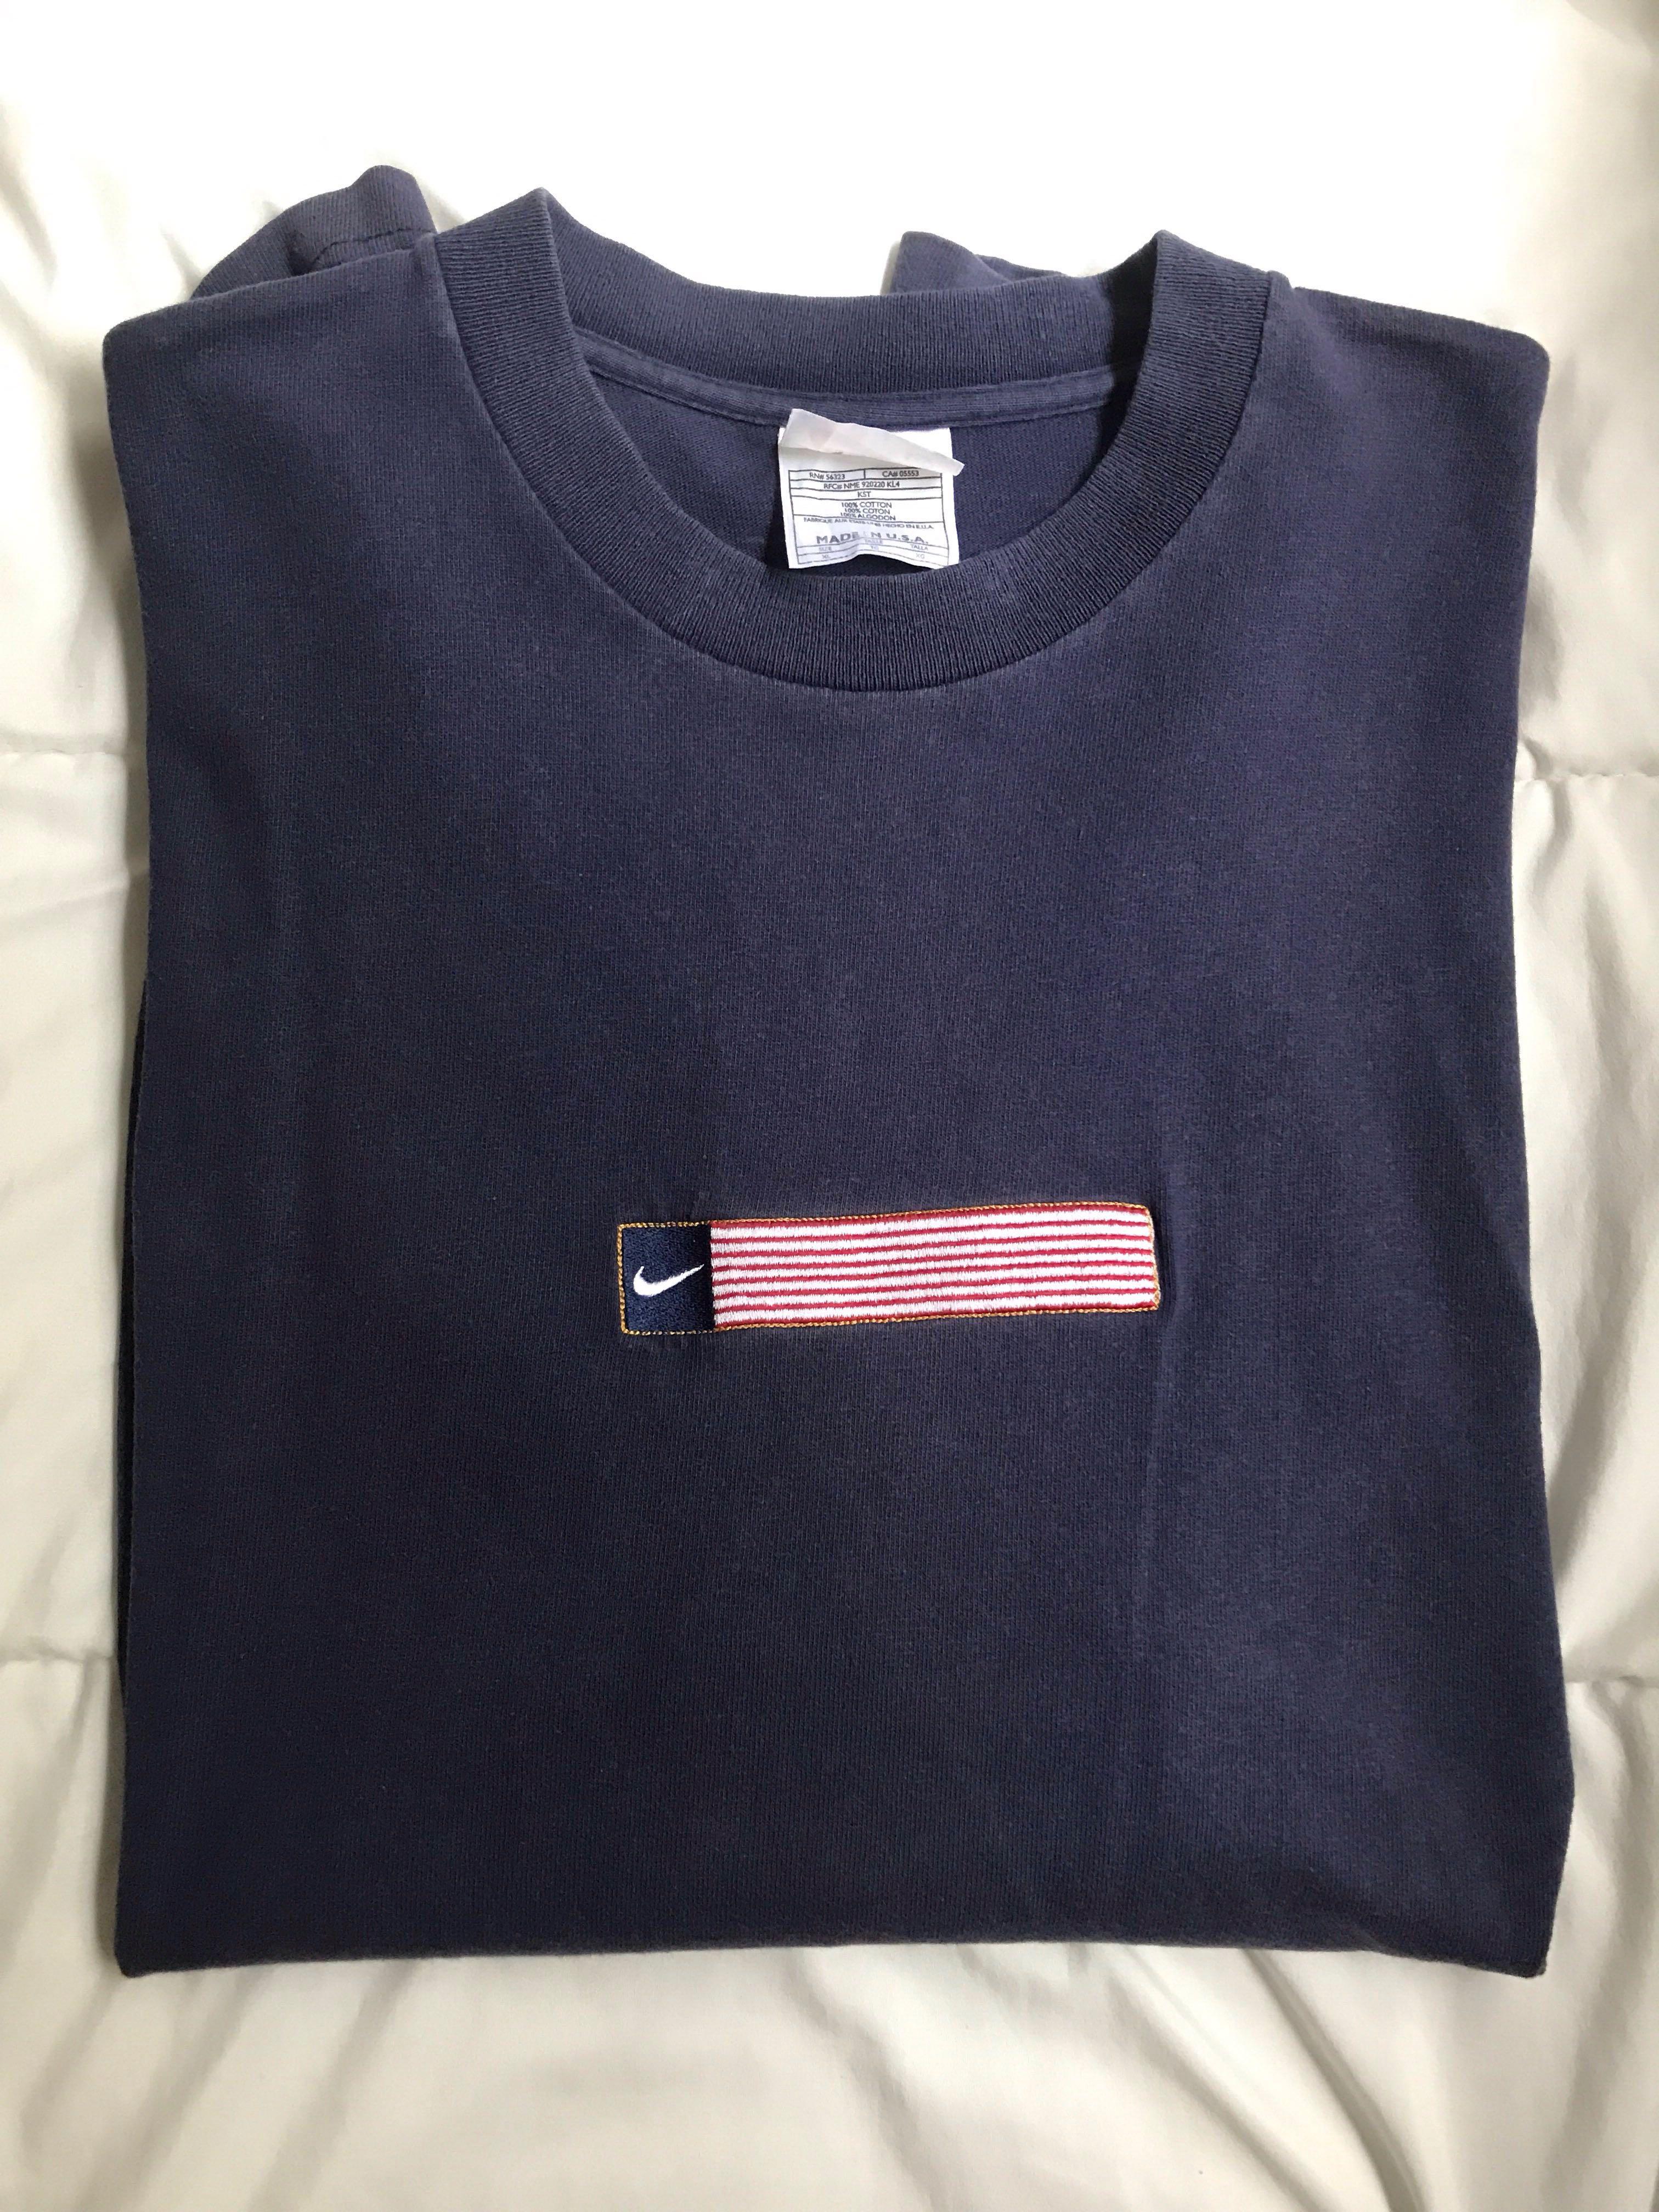 release date: e0d0c 4e0c4 Vintage Nike T-Shirt, Mens Fashion, Clothes, Tops on Carouse